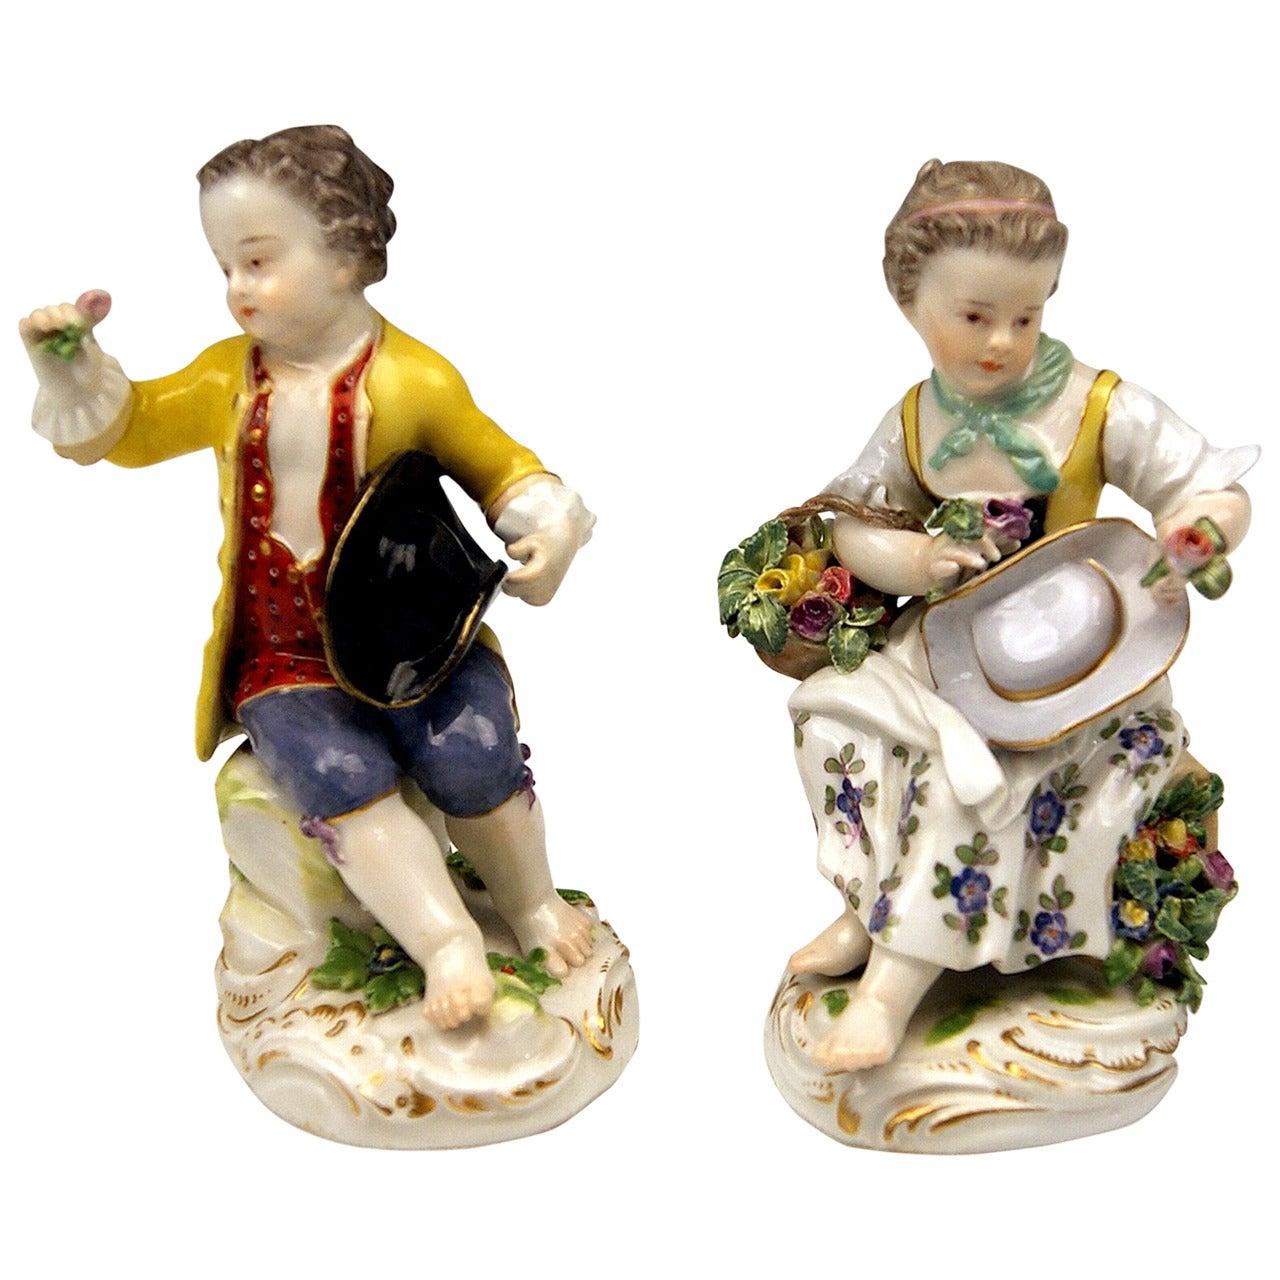 Meissen Pair of Gardener Child Rococo Figurines, Model 17 by Kaendler, 1870